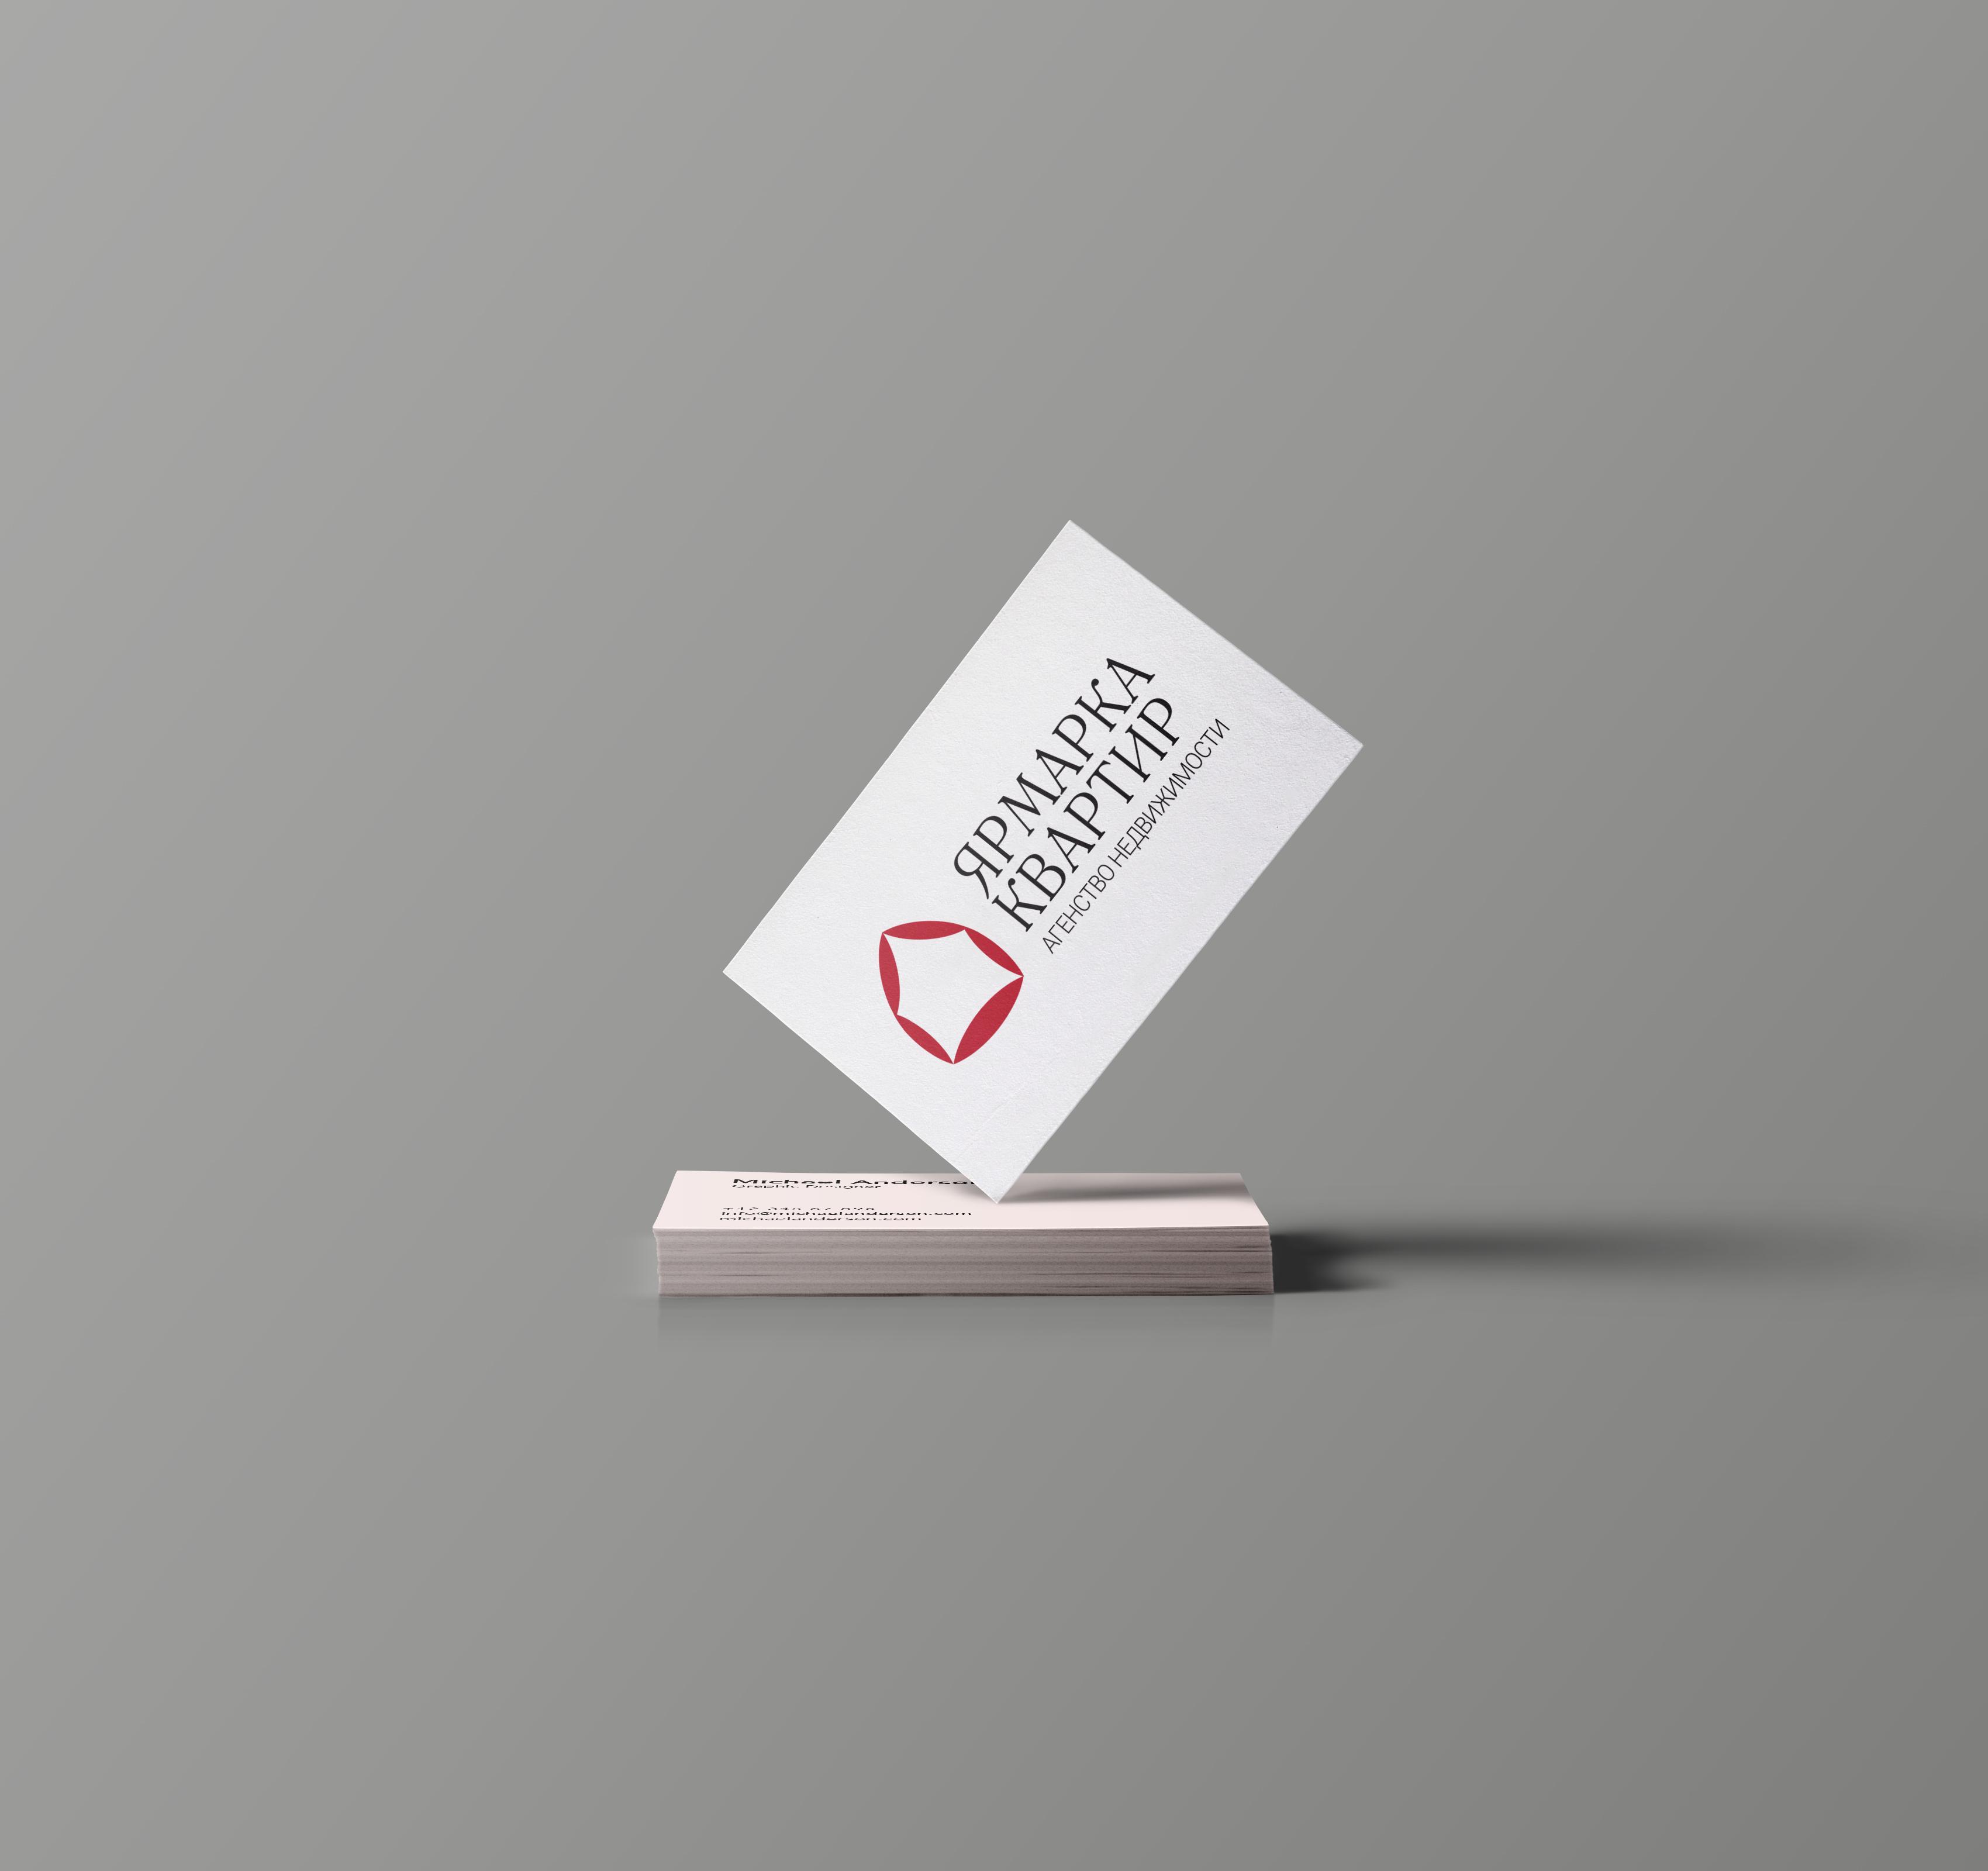 Создание логотипа, с вариантами для визитки и листовки фото f_7216004c1abb53d8.jpg